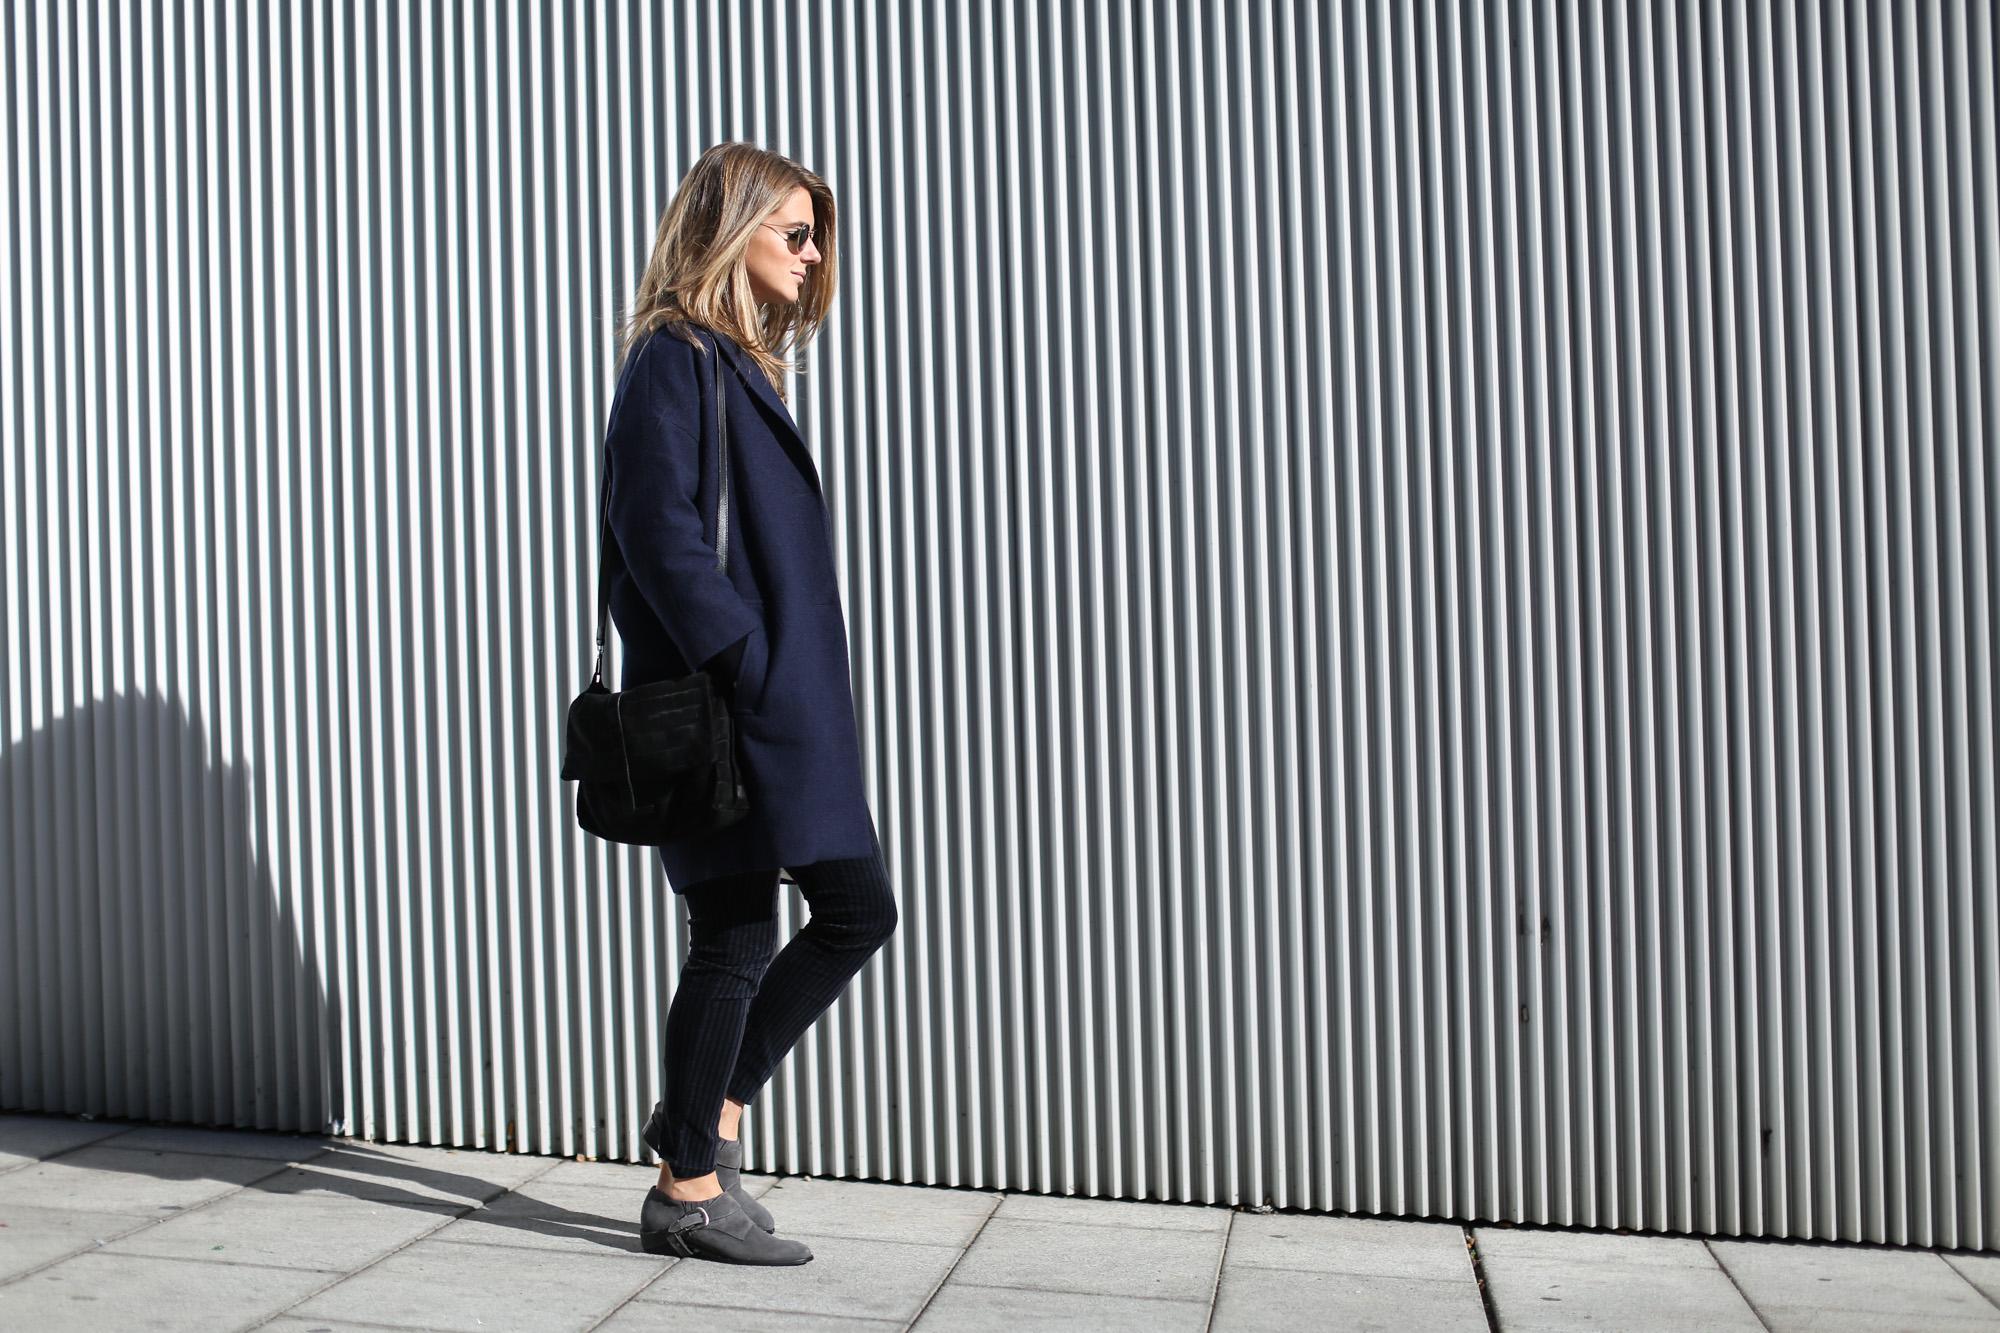 Clochet_streetstyle_muitt_madrid_zapatos_oxford_abrigo_masscob_lacoruña_trimmerbilbao-2